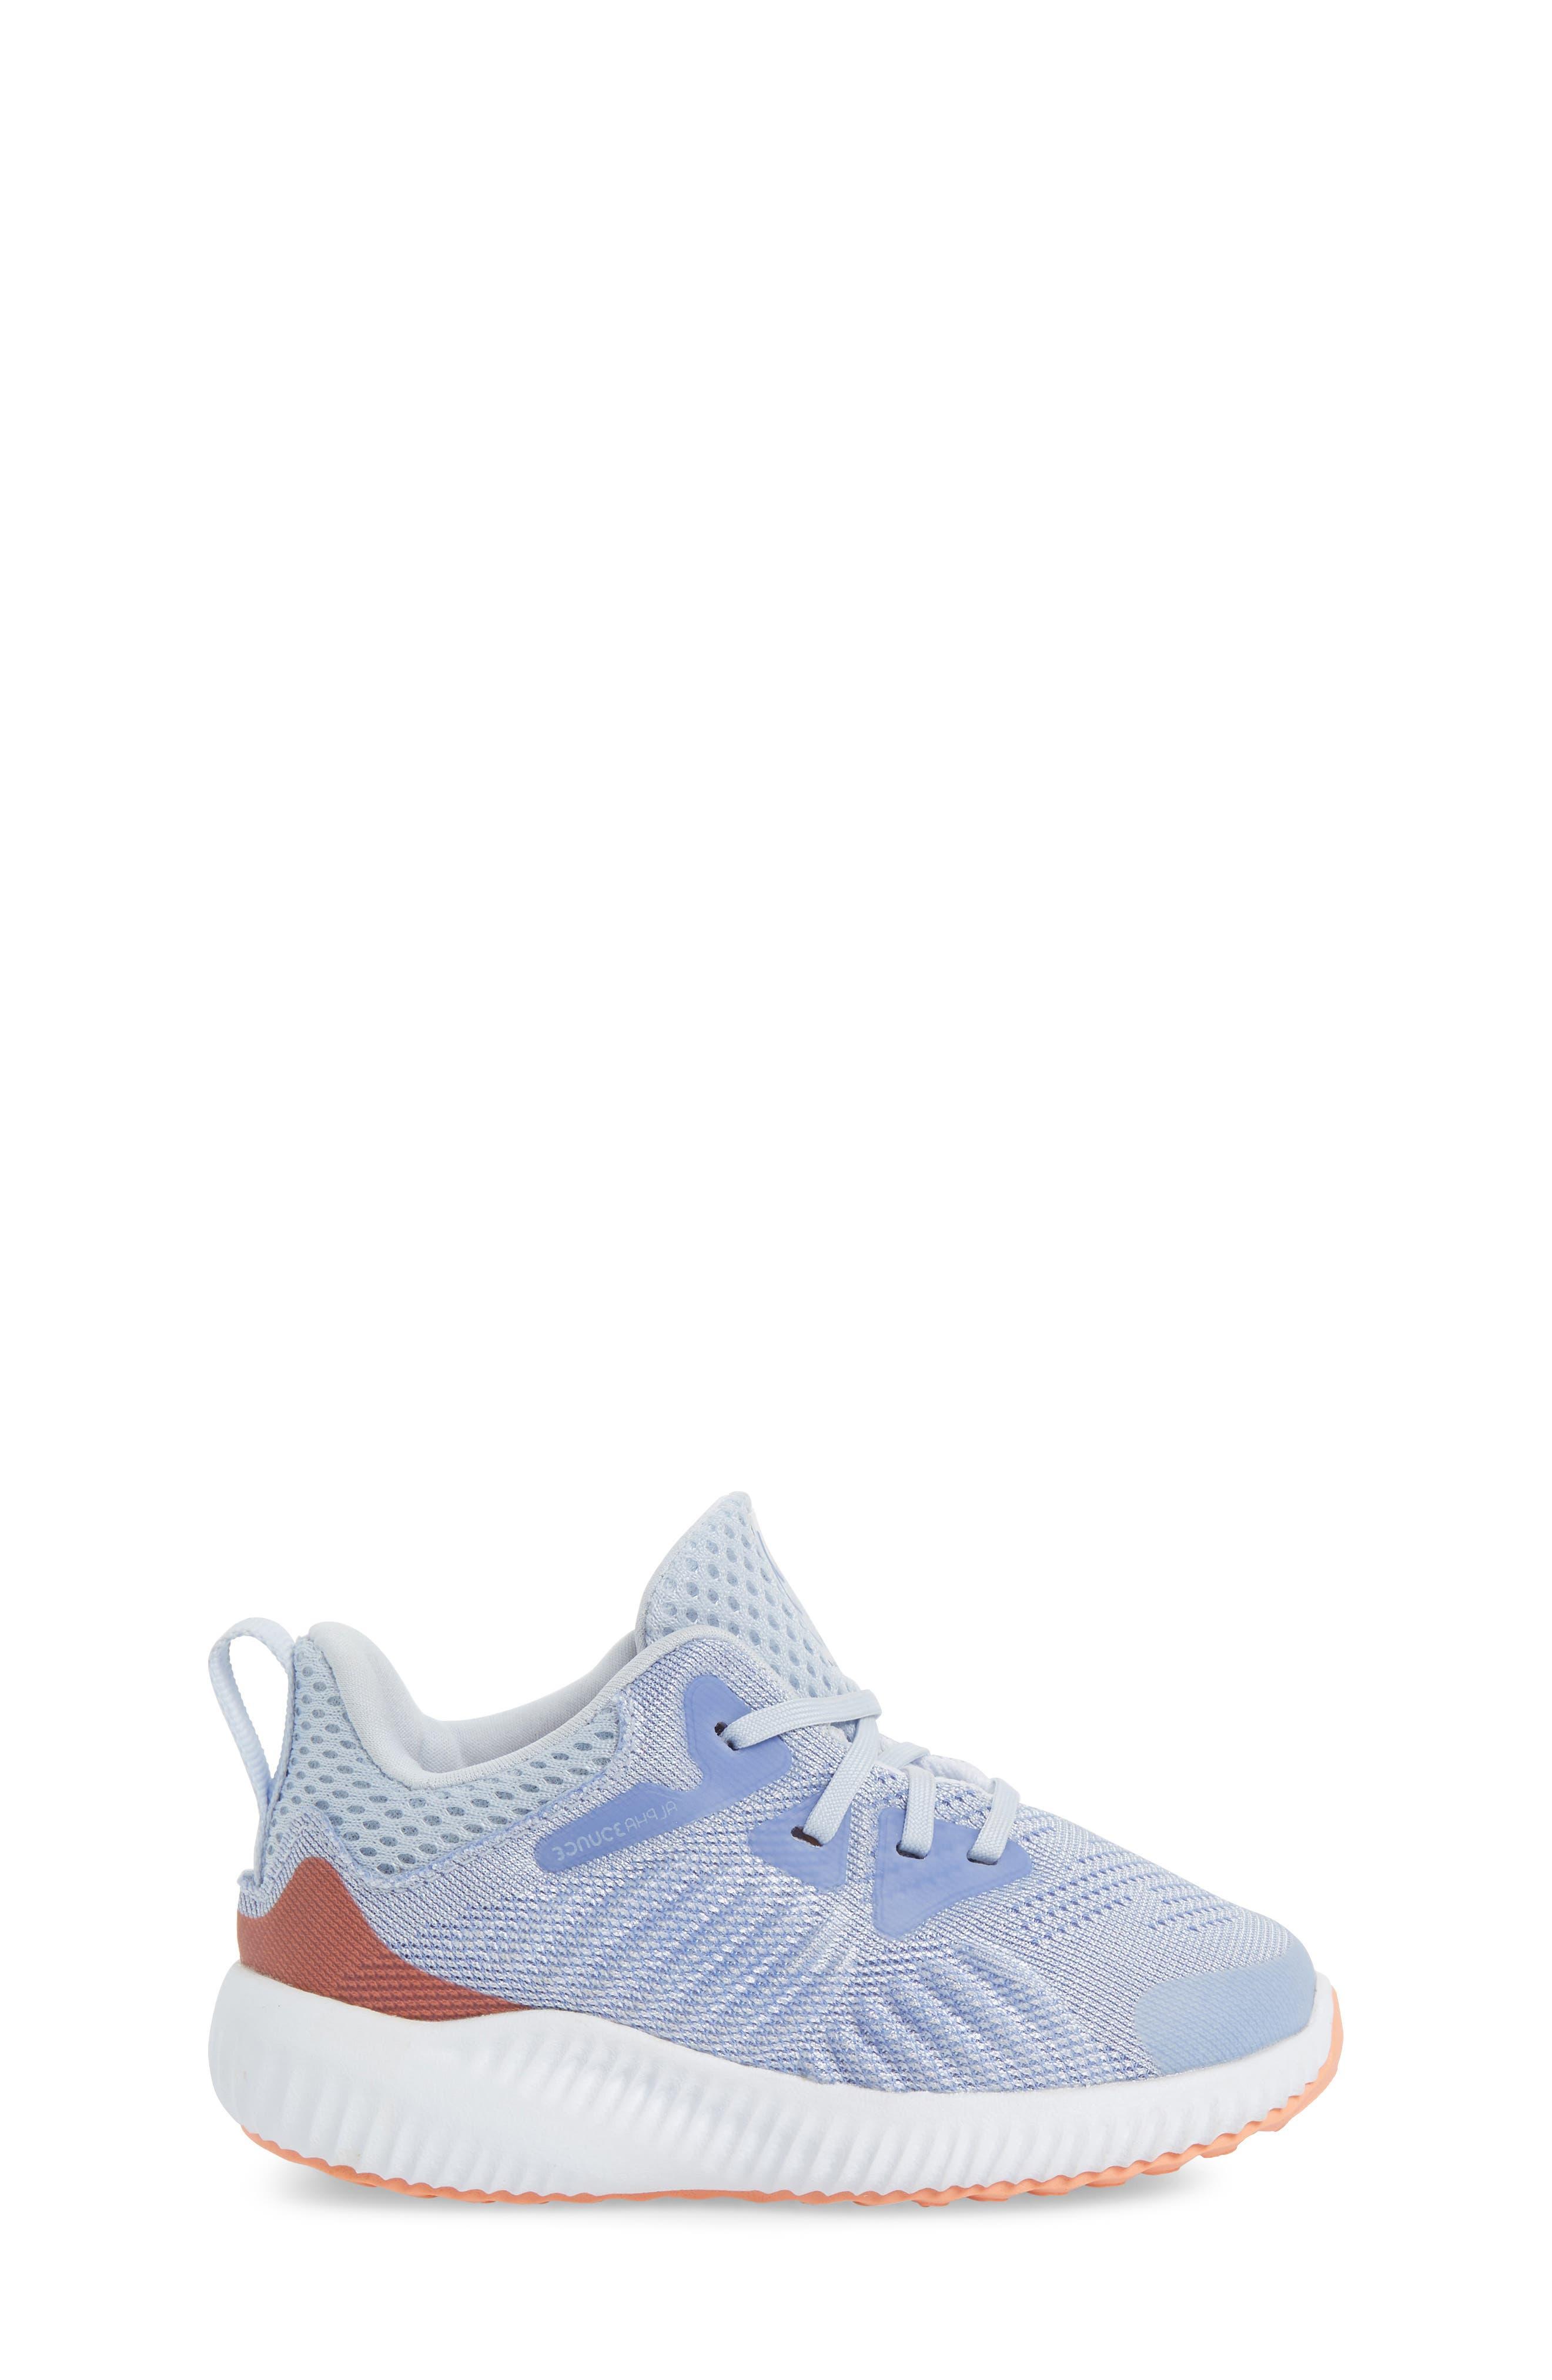 Alternate Image 3  - adidas AlphaBounce Beyond Running Shoe (Baby, Walker, Toddler, Little Kid & Big Kid)